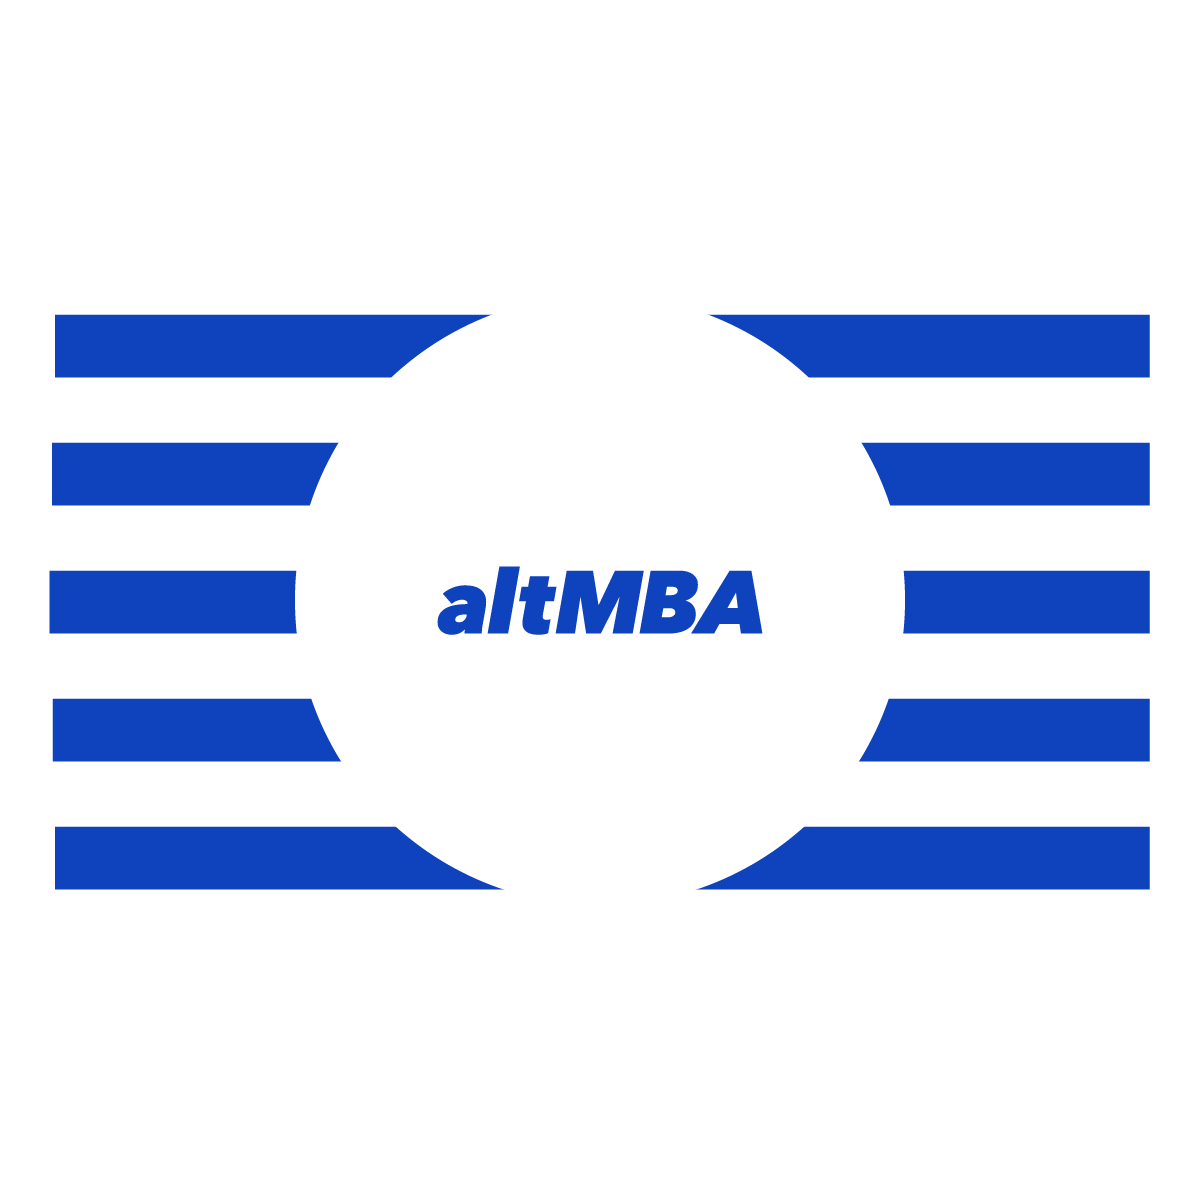 Seth Godin's altMBA